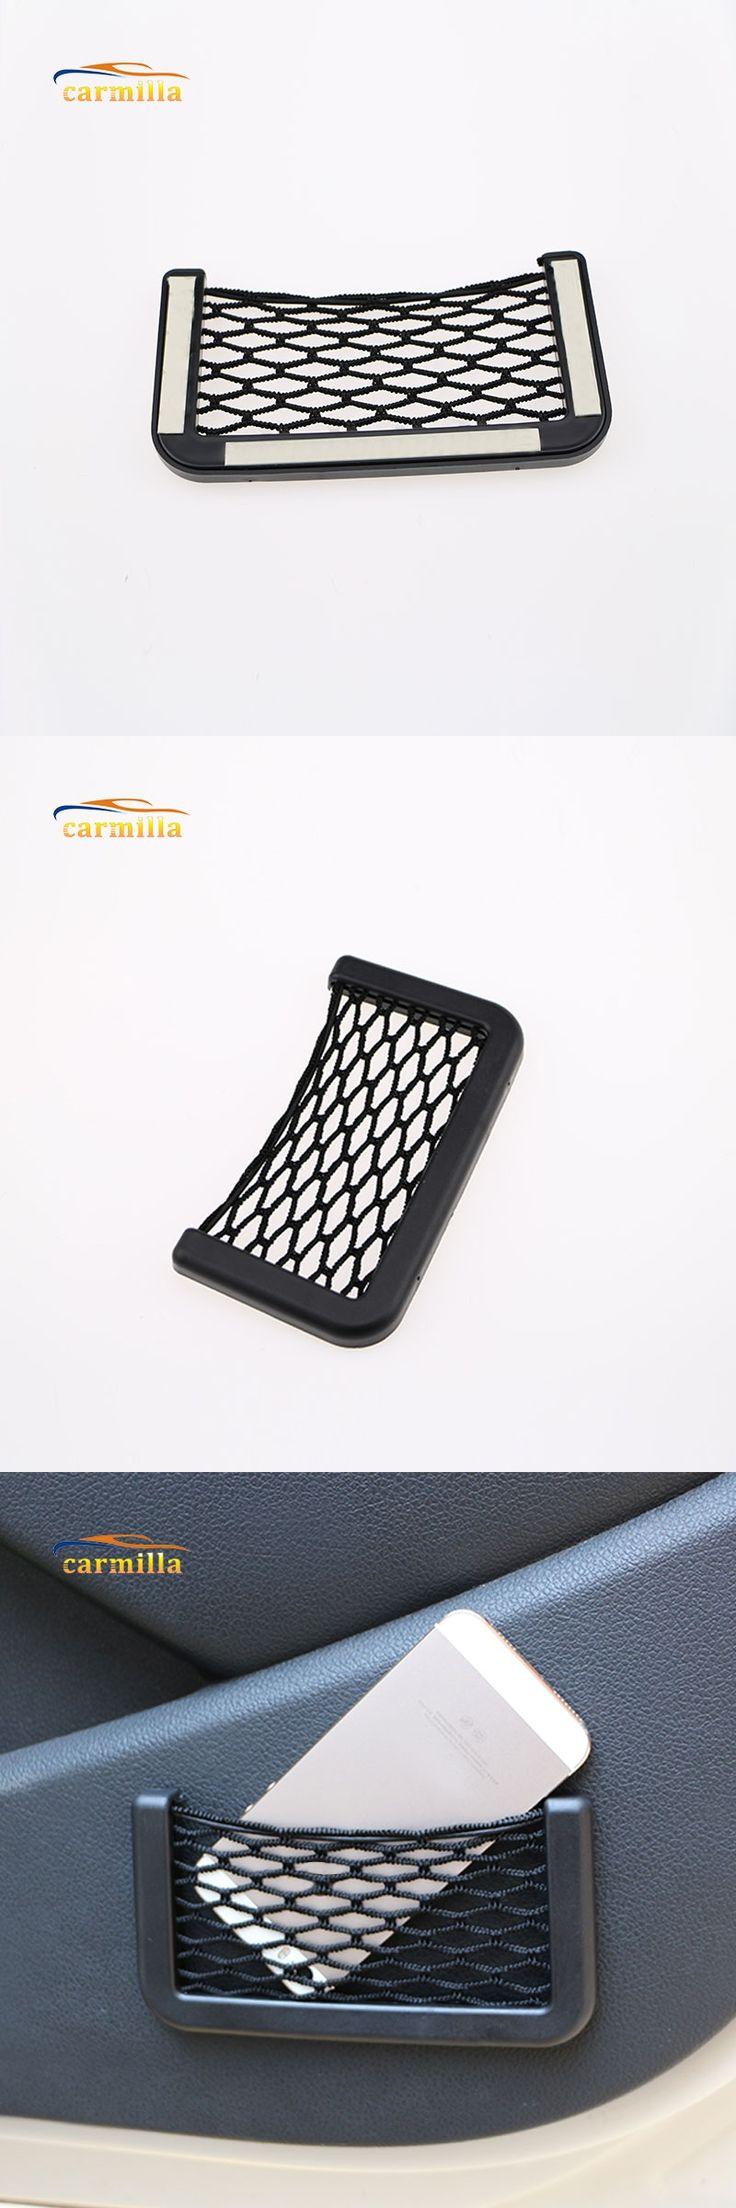 Car Carrying Bag Car Styling Car Phone Net Case For Citroen C2 C3 C4 C5 C6 Quatre DS3 DS 3 DS4 DS 4 DS5 DS 5 DS6 DS 6